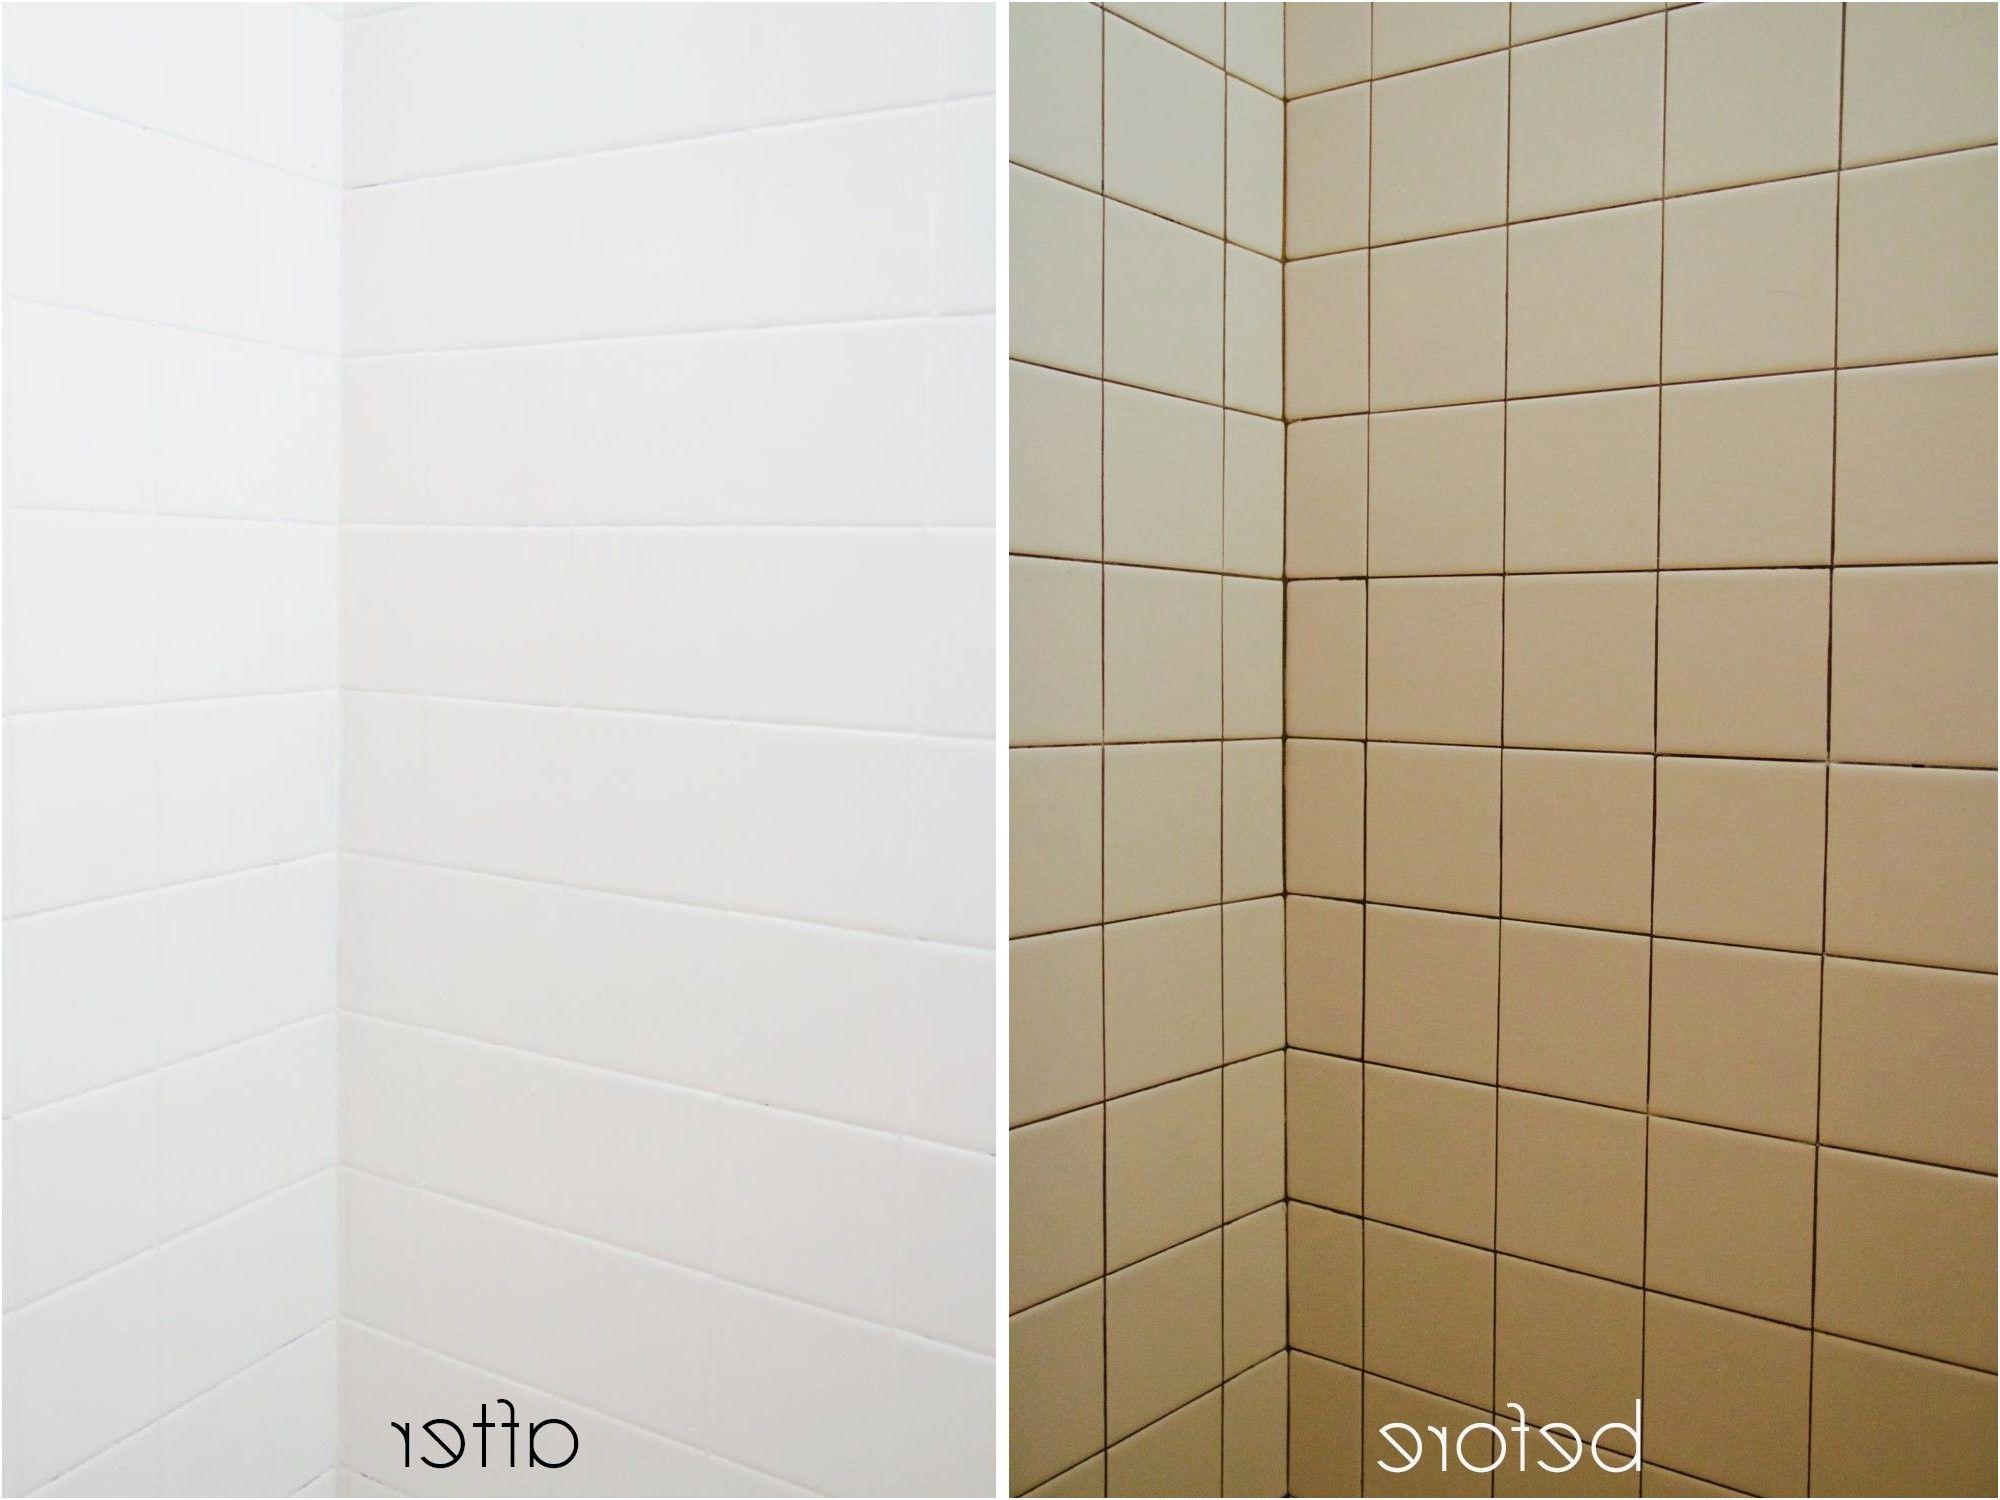 awesome Luxury Can U Paint Bathroom Tiles | mifd283.com | Pinterest ...